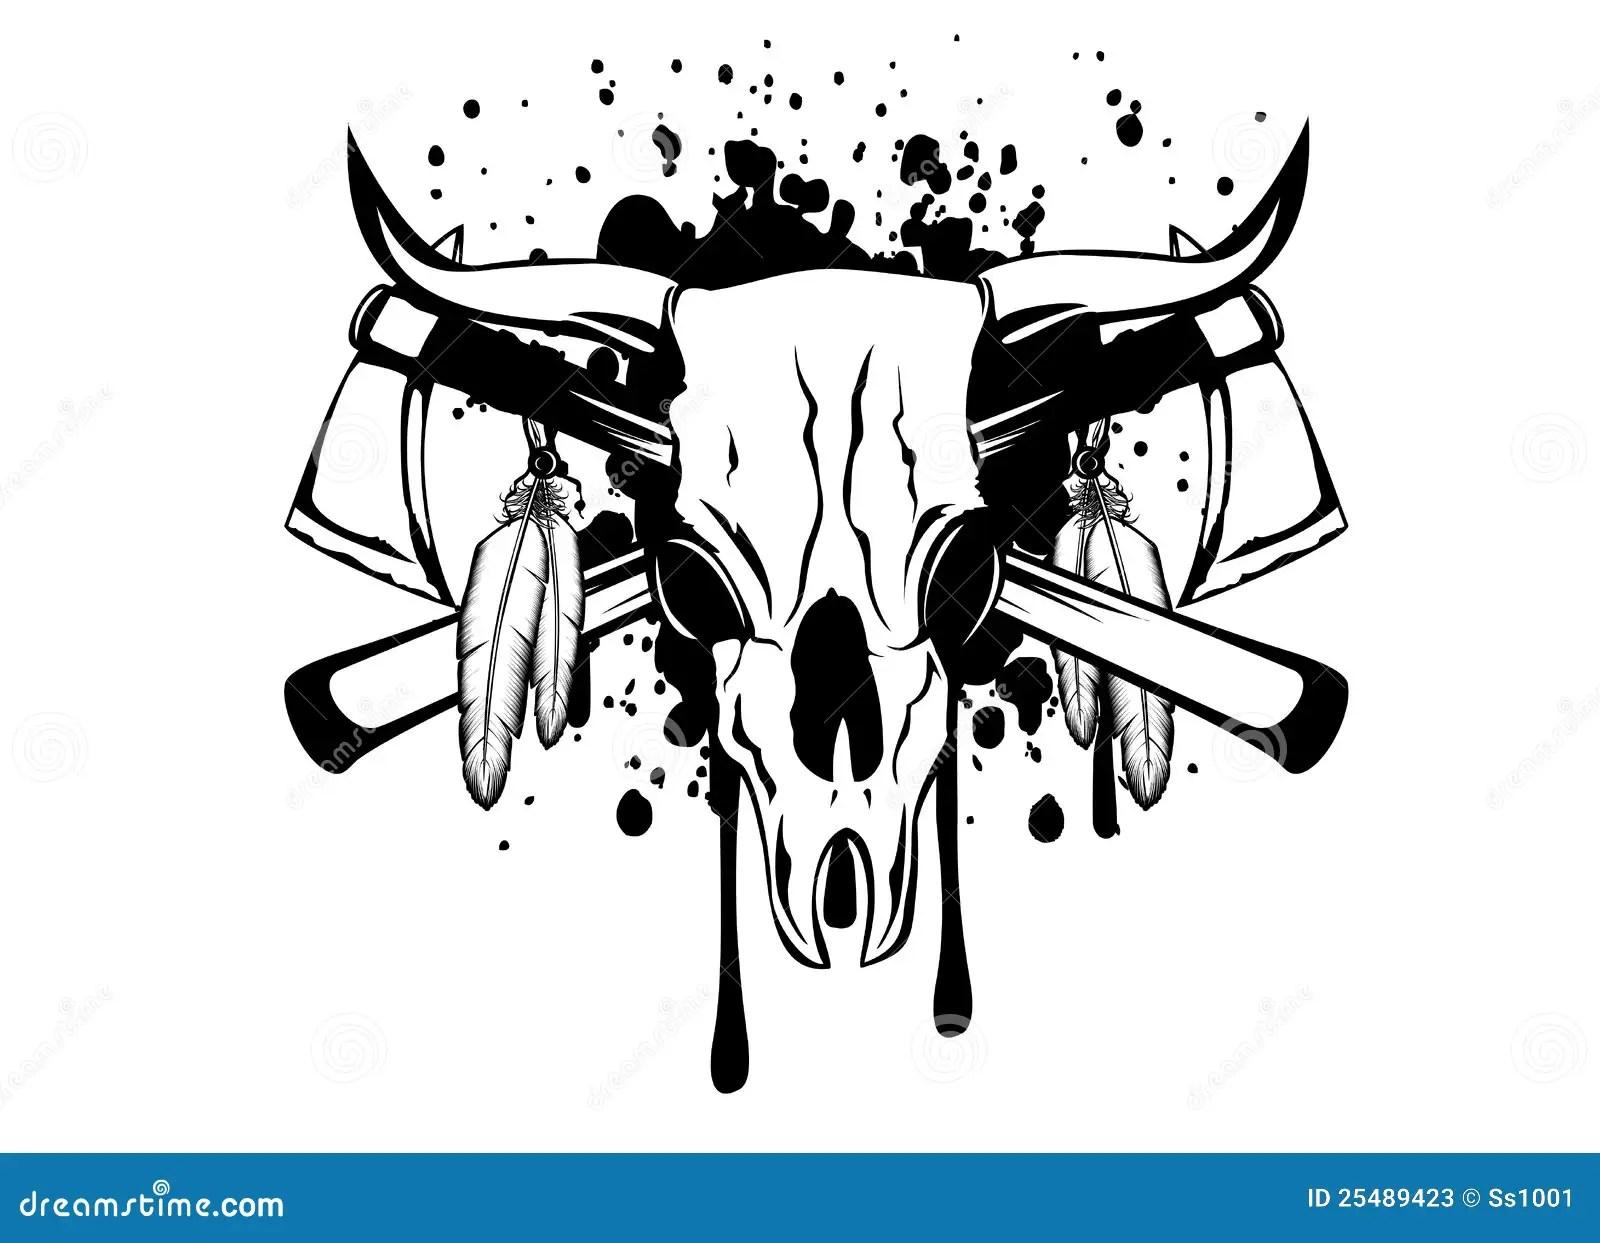 Skull Bull And Crossed Axes Cartoon Vector